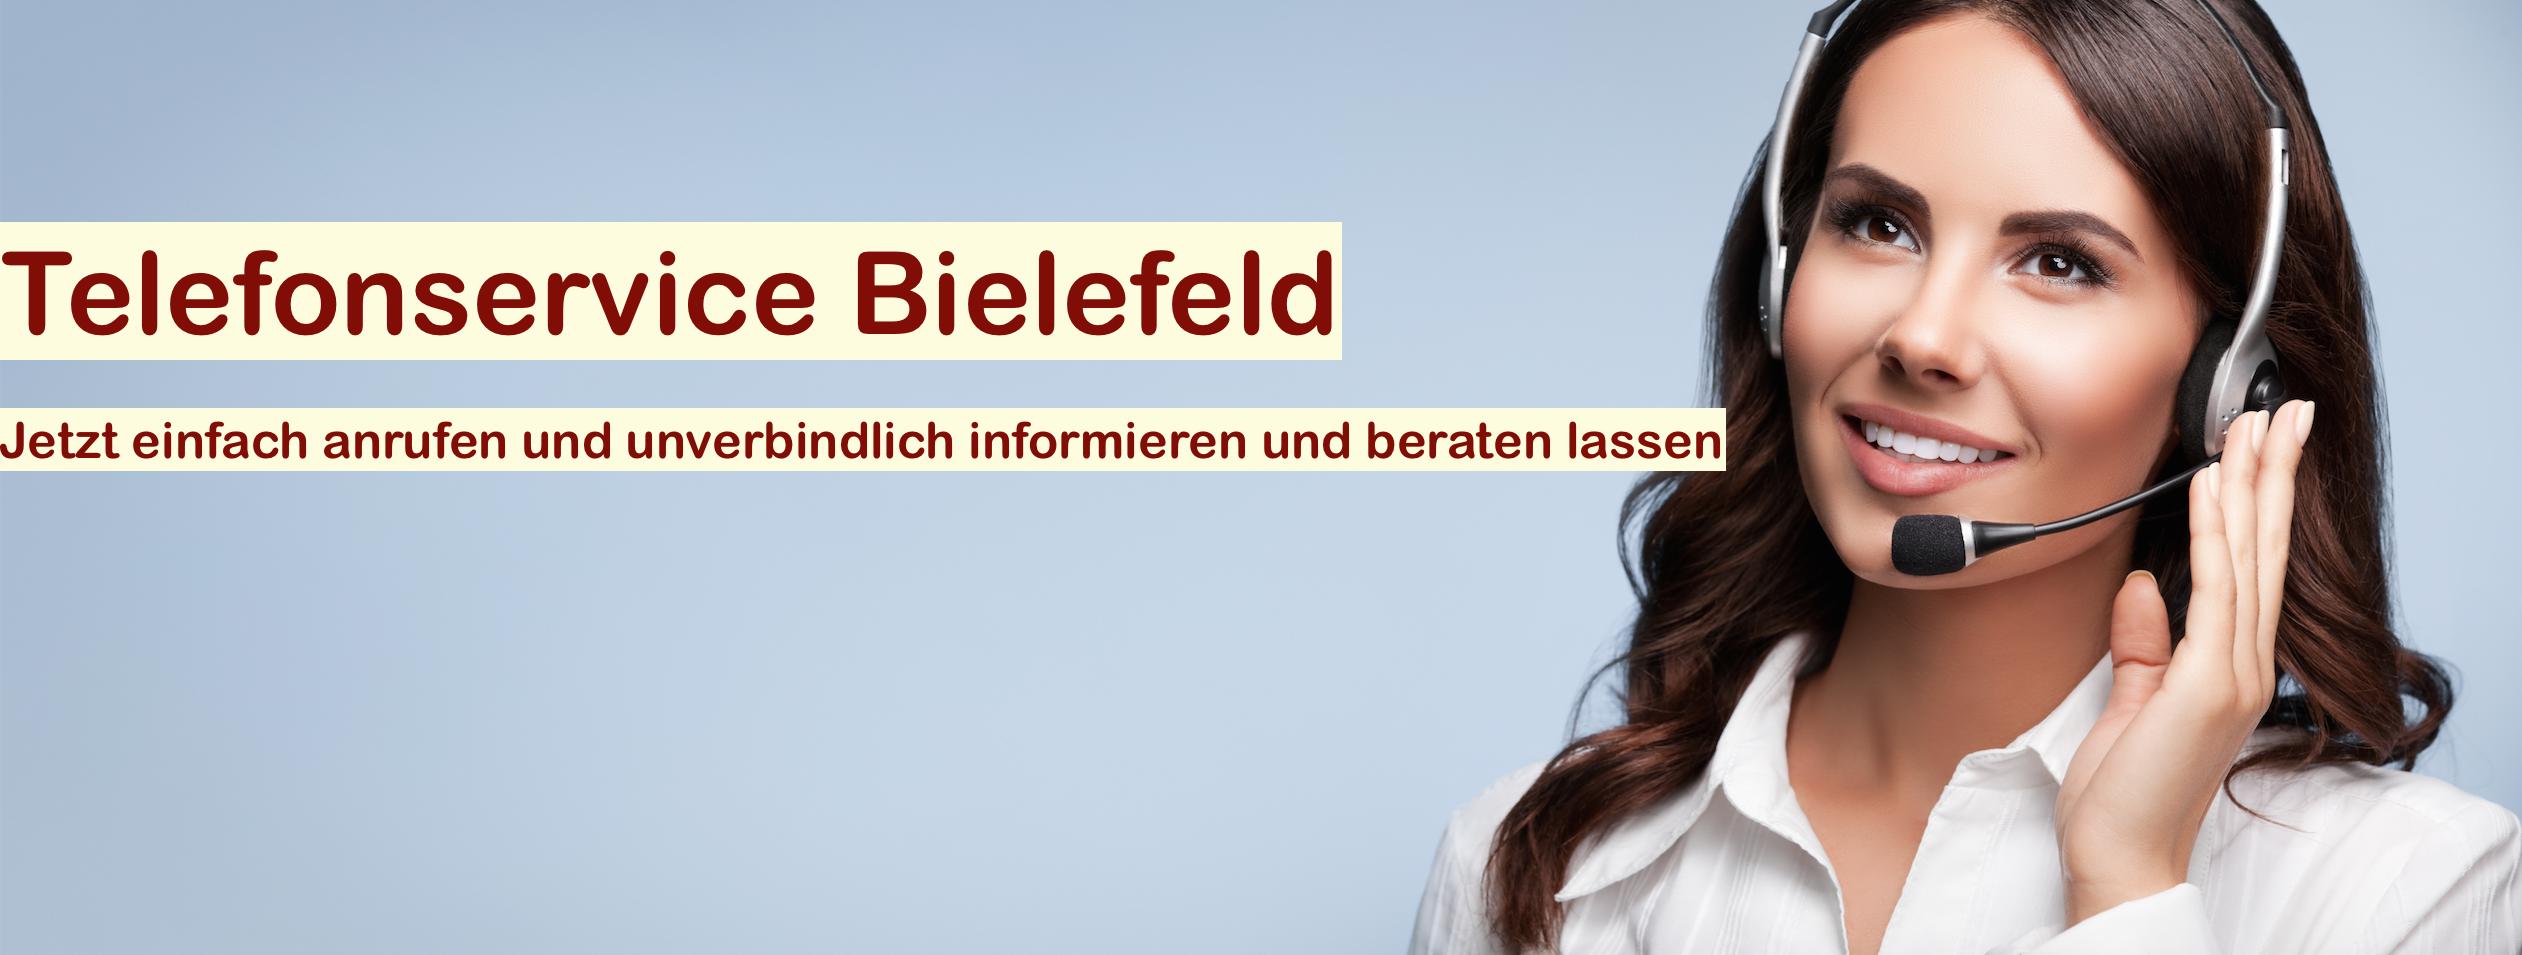 Telefonservice Bielefeld